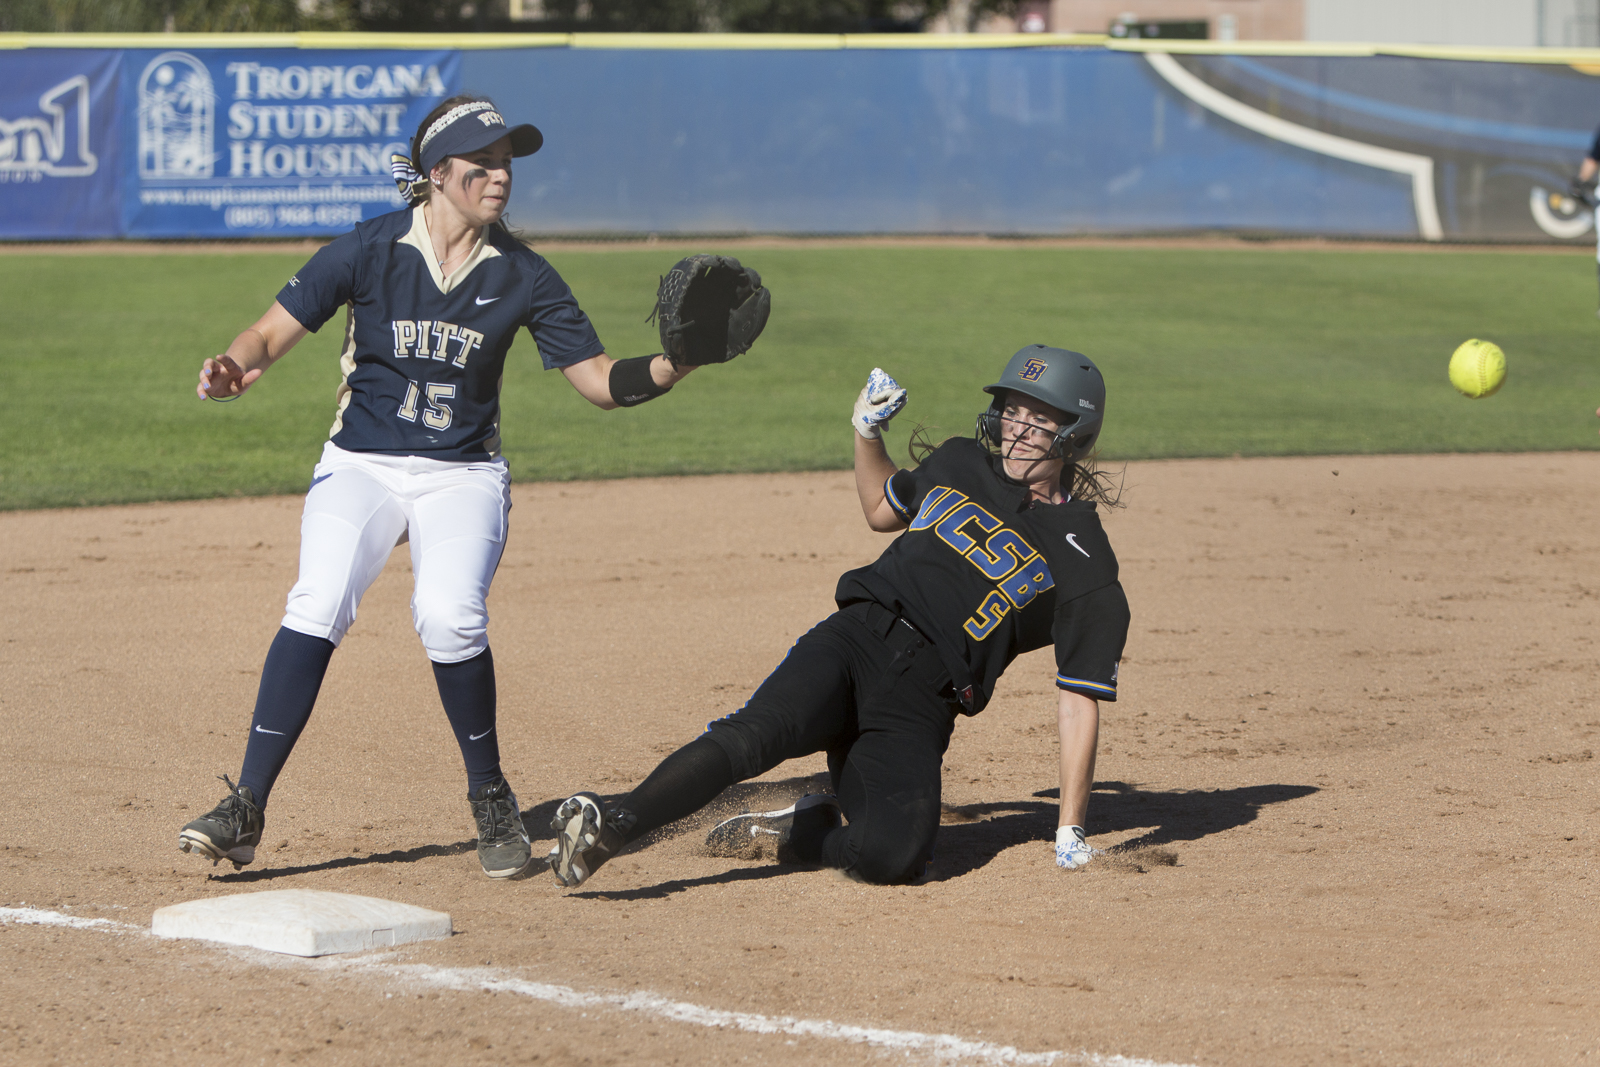 Jessica Johnston slides into third base right before the ball. Dustin Harris/Daily Nexus